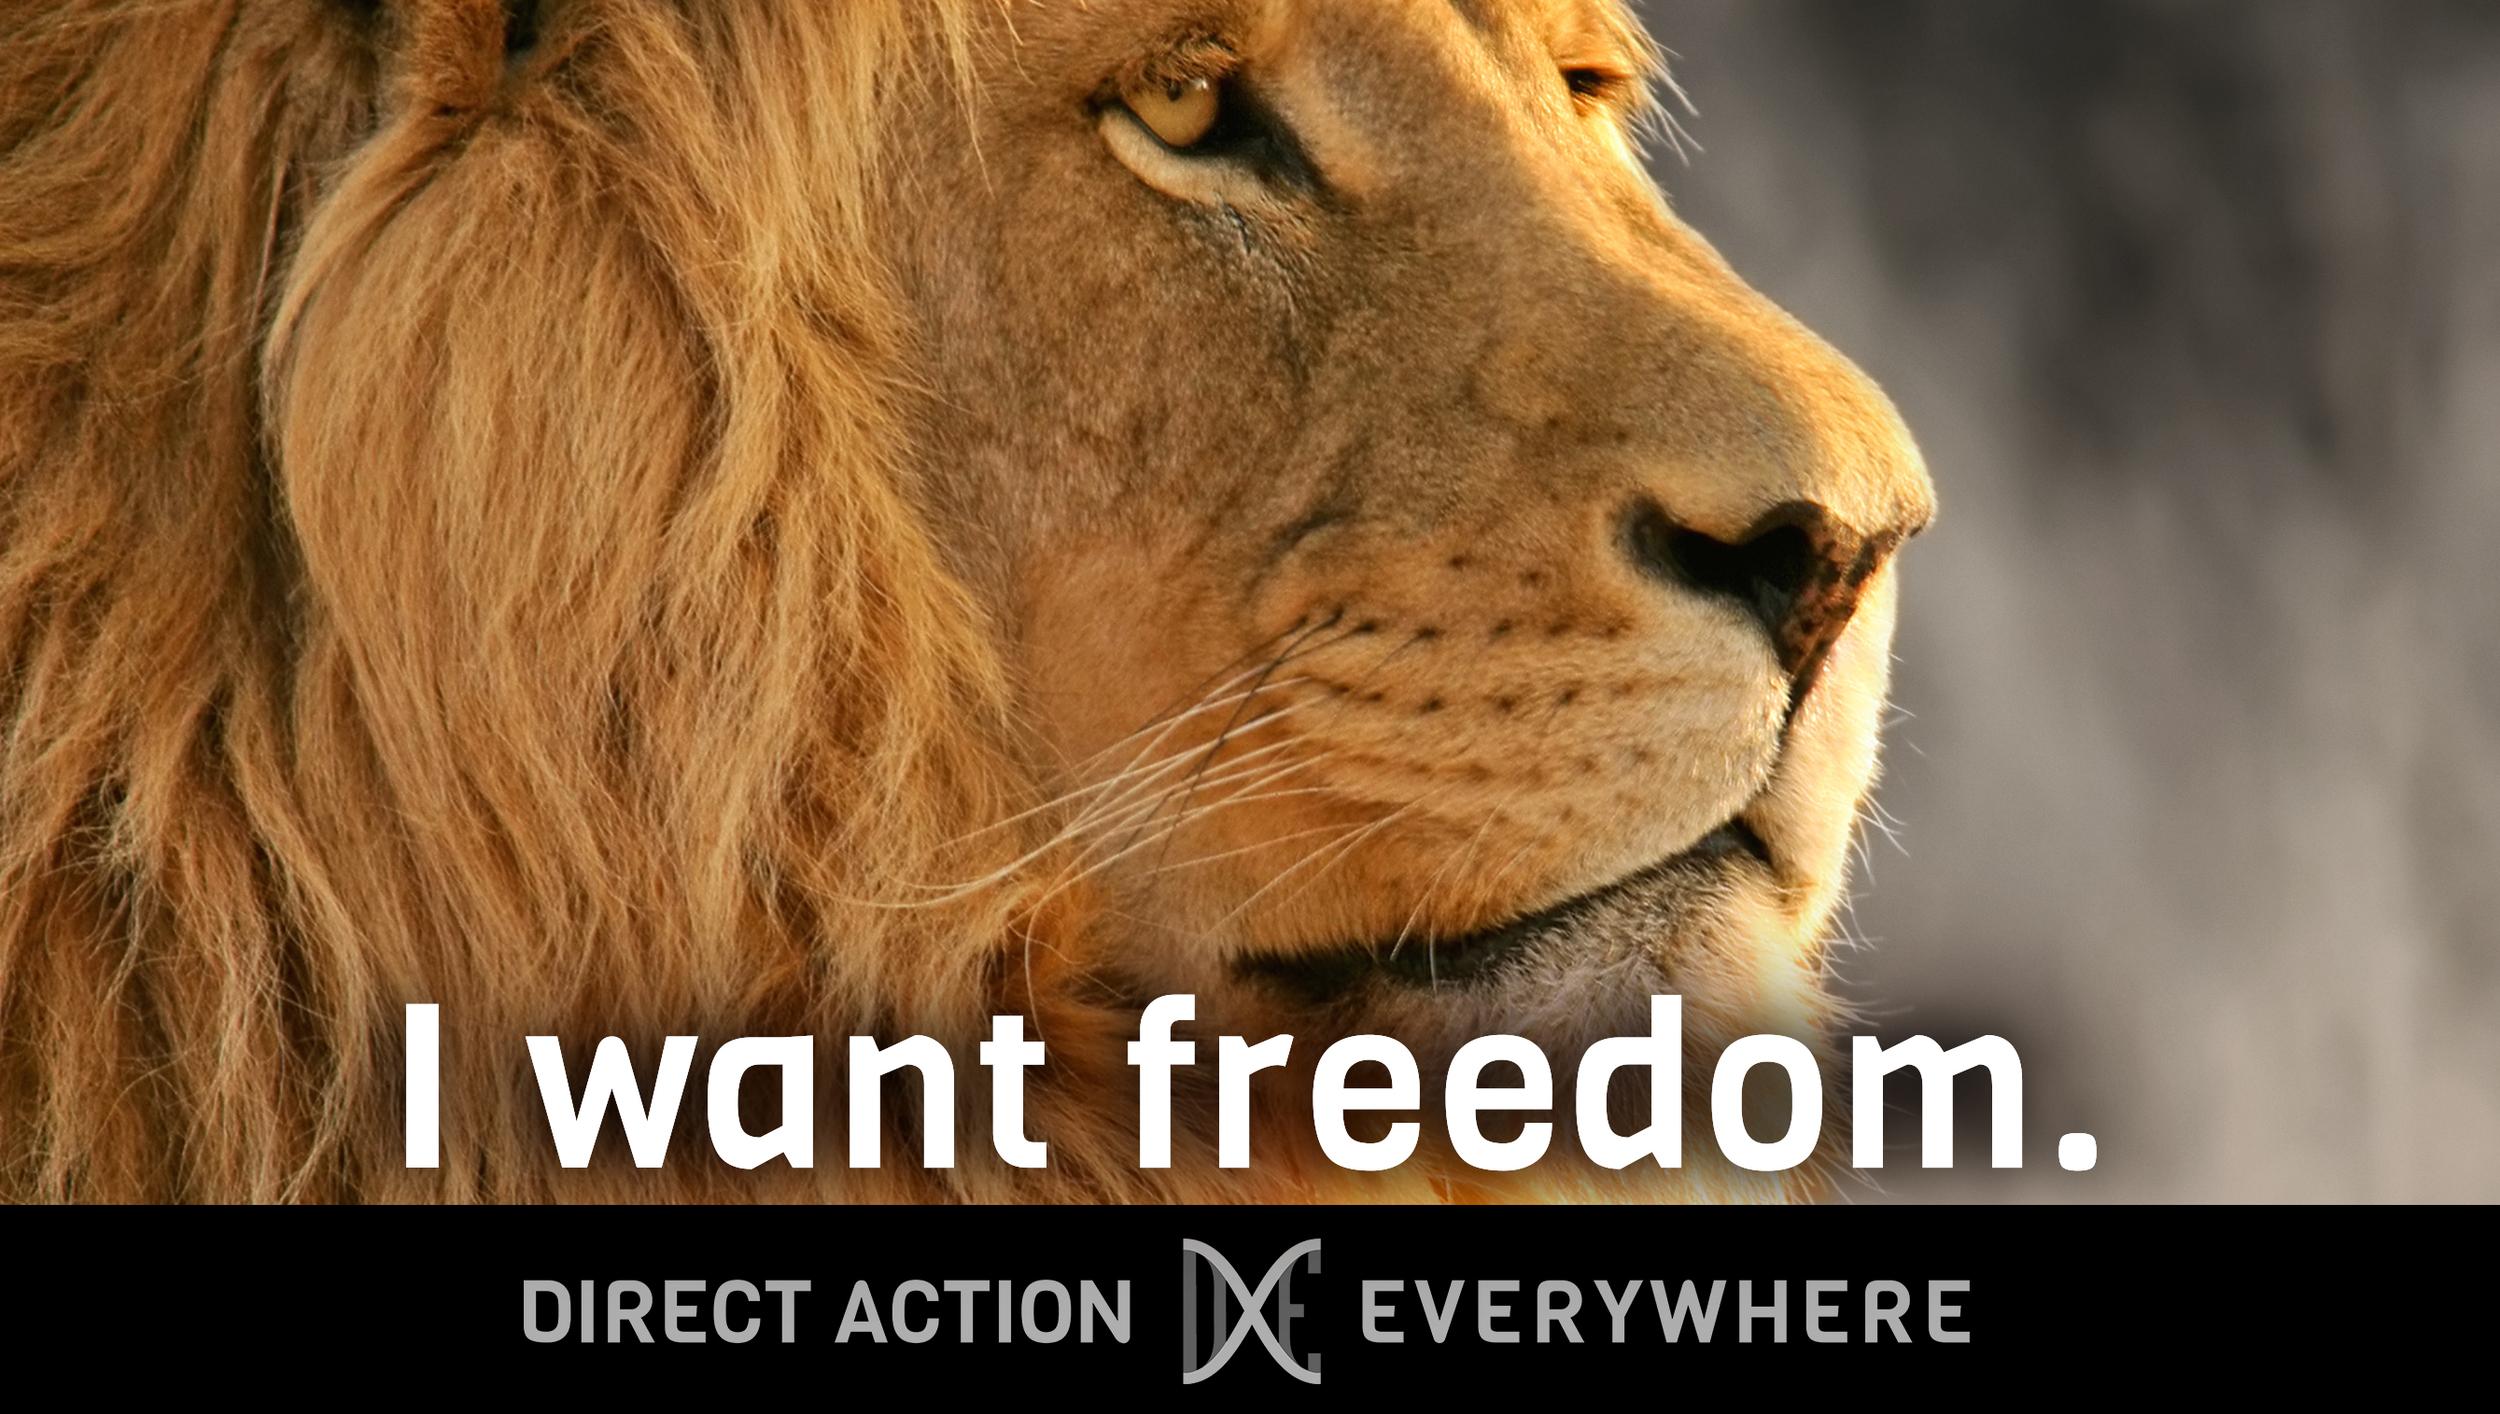 iwantfreedom_lion.jpg